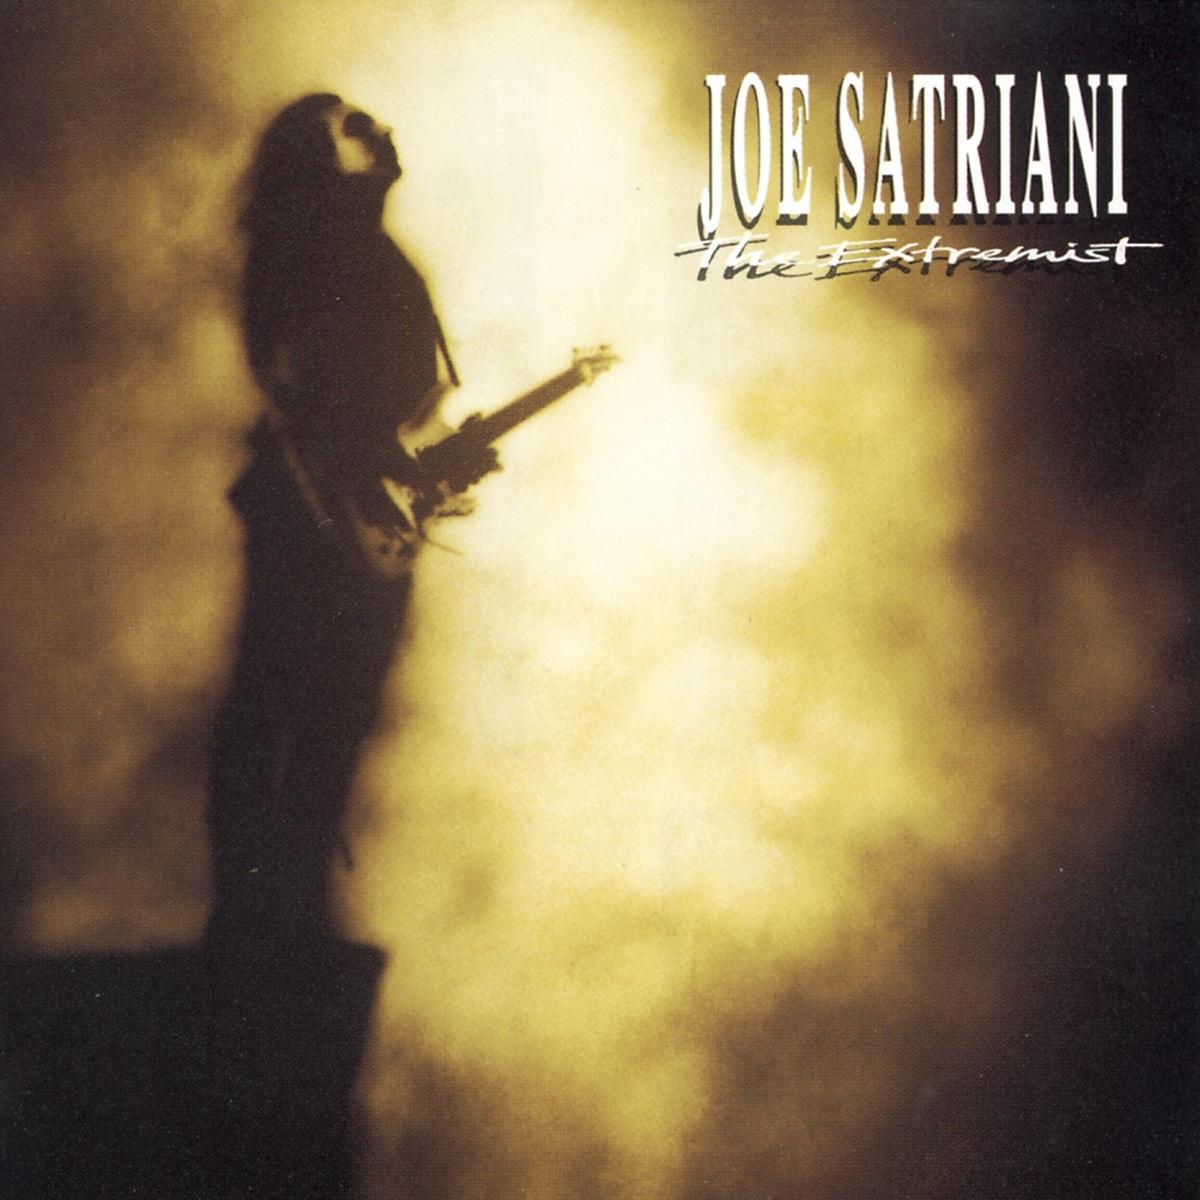 The Extremist Joe Satriani CD cover